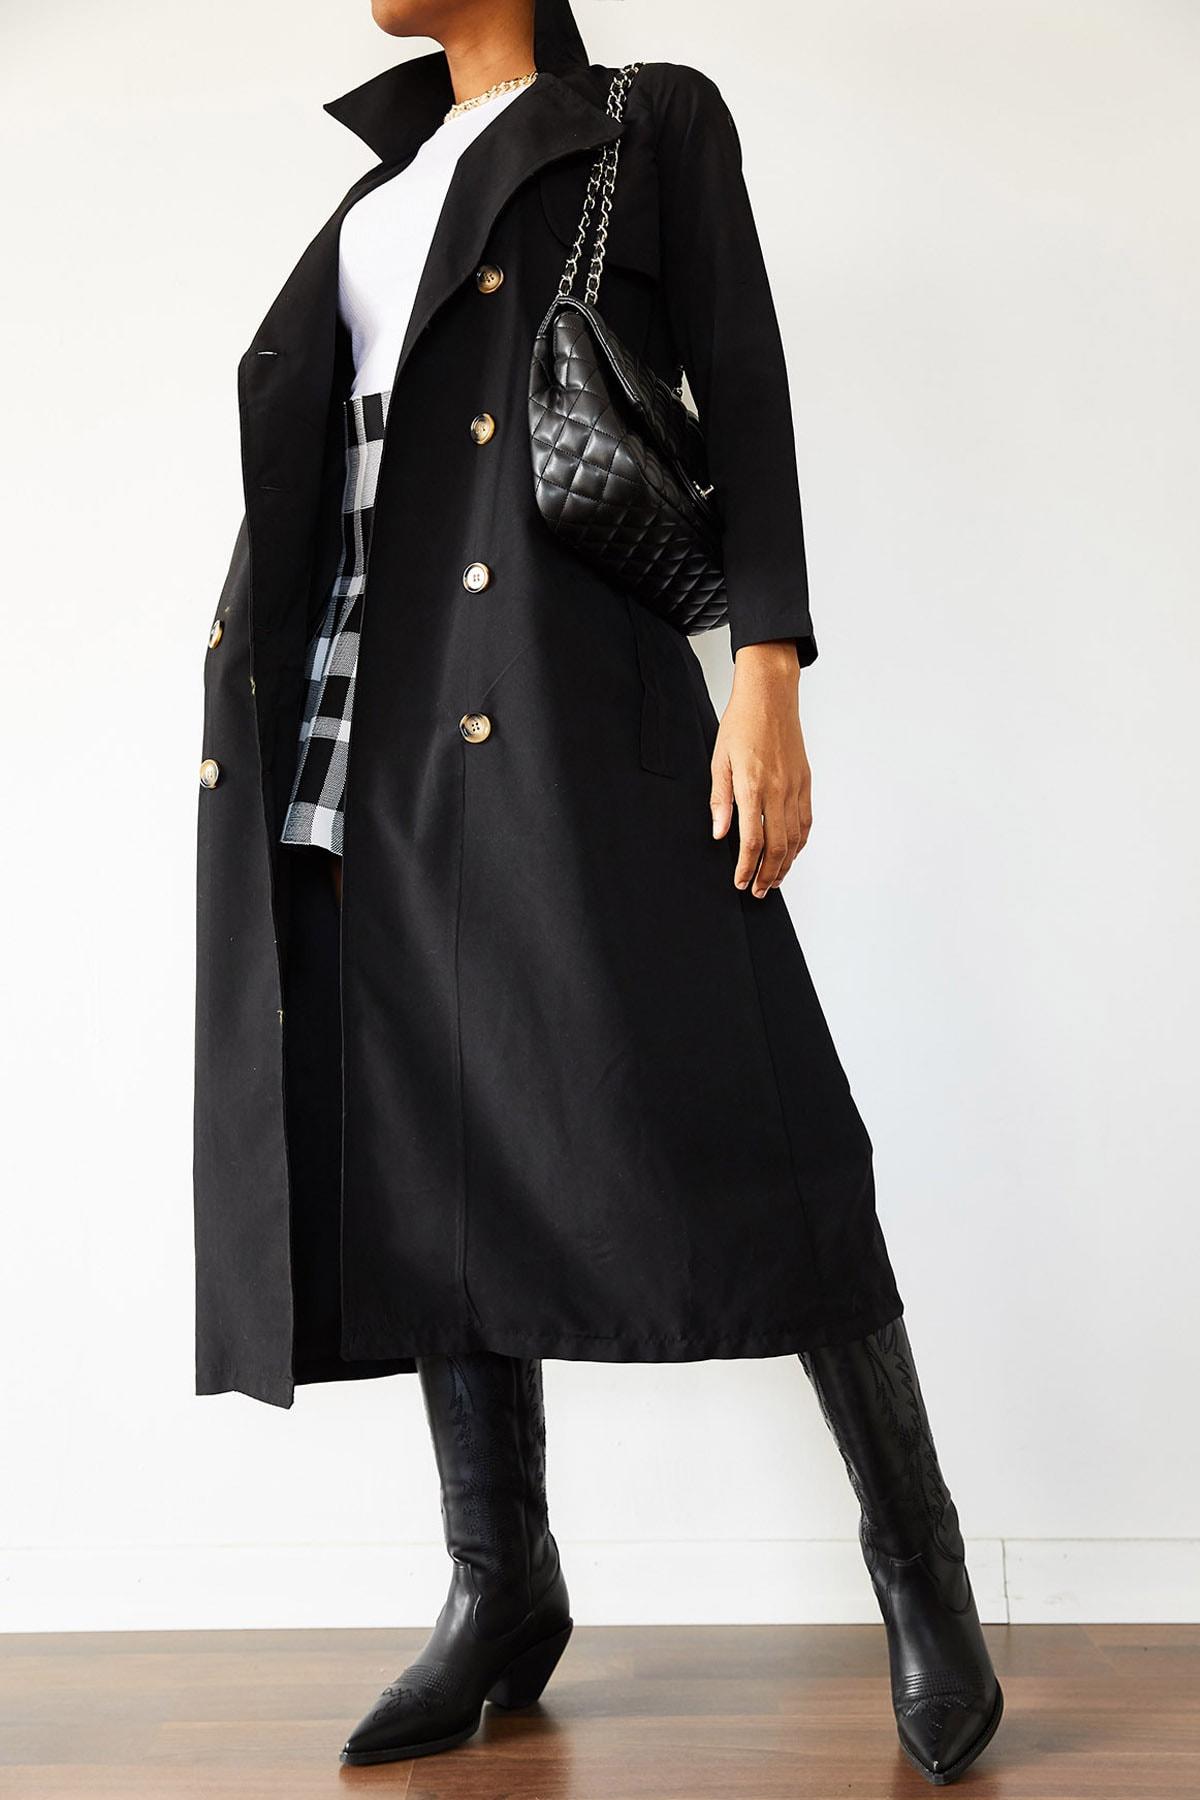 XENA Kadın Siyah Şal Yaka Düğmeli Trençkot 1KZK4-10759-02 1